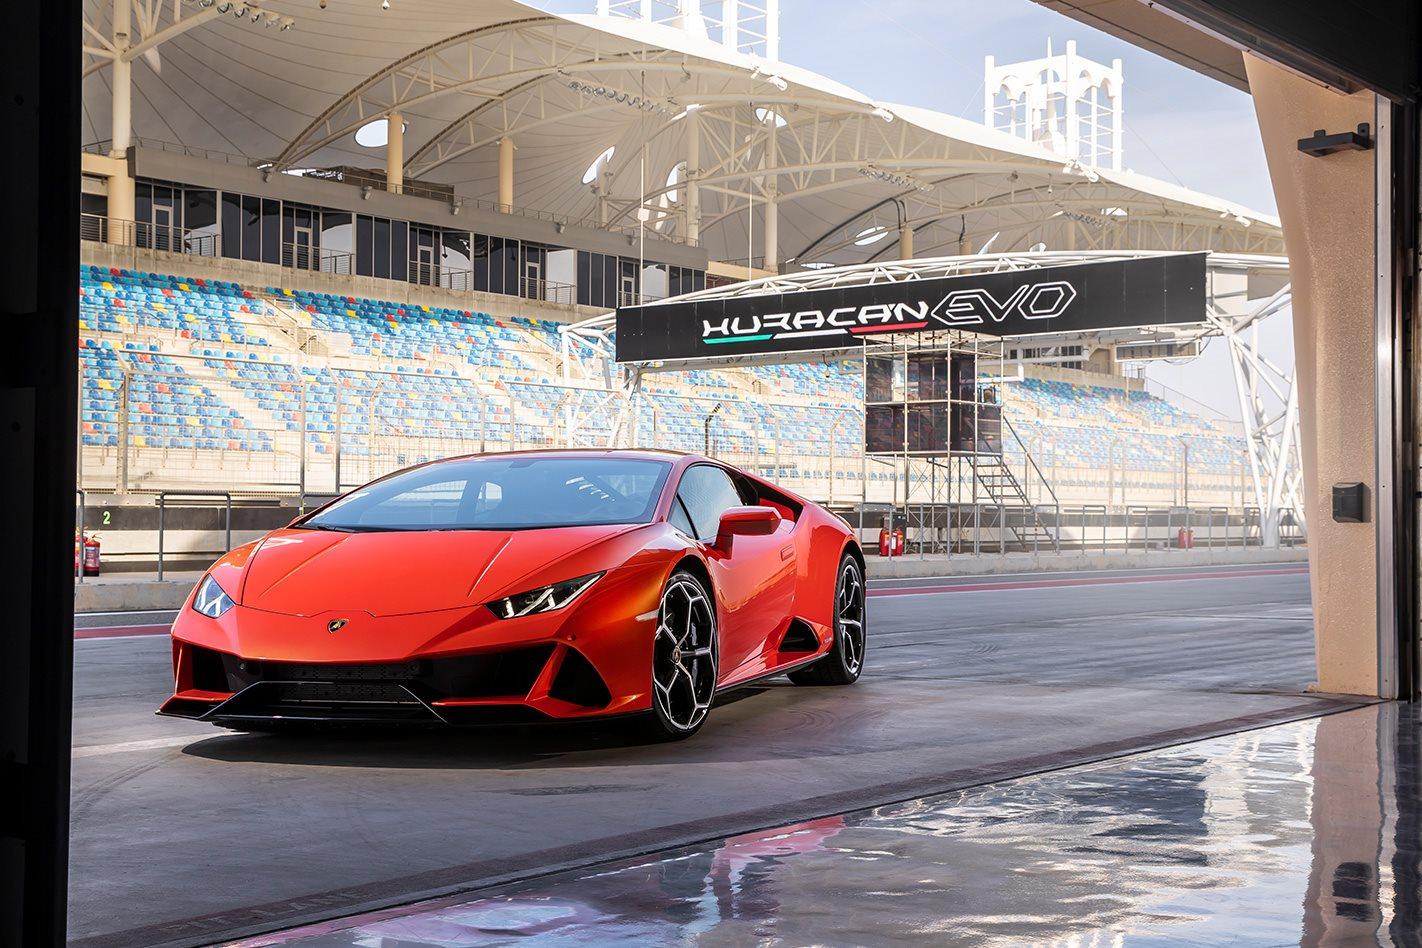 2019 Lamborghini Huracan Evo Price Features And